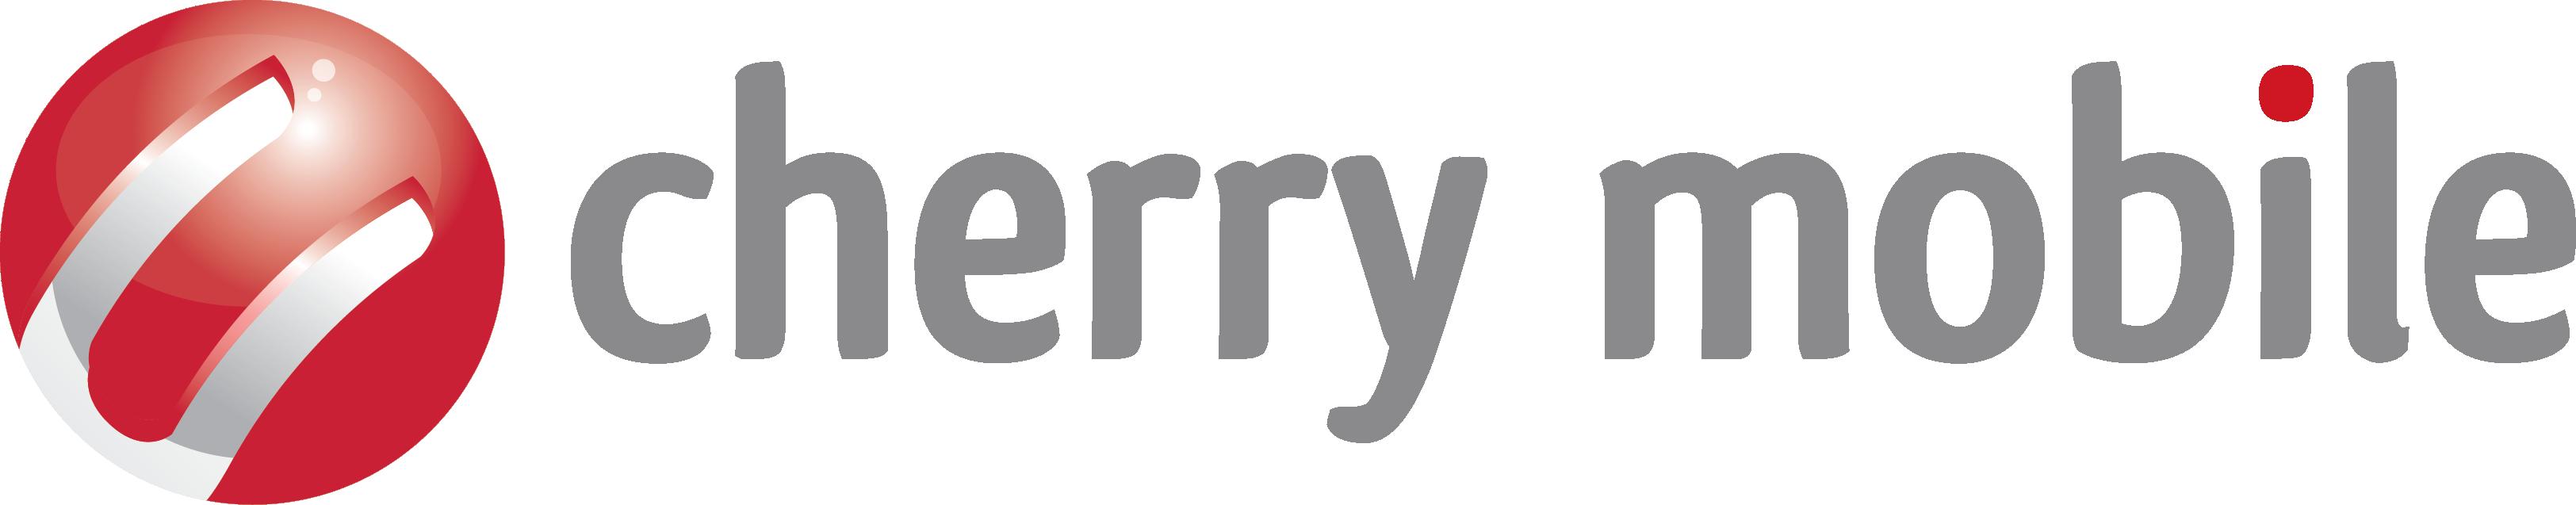 Cherrymobile